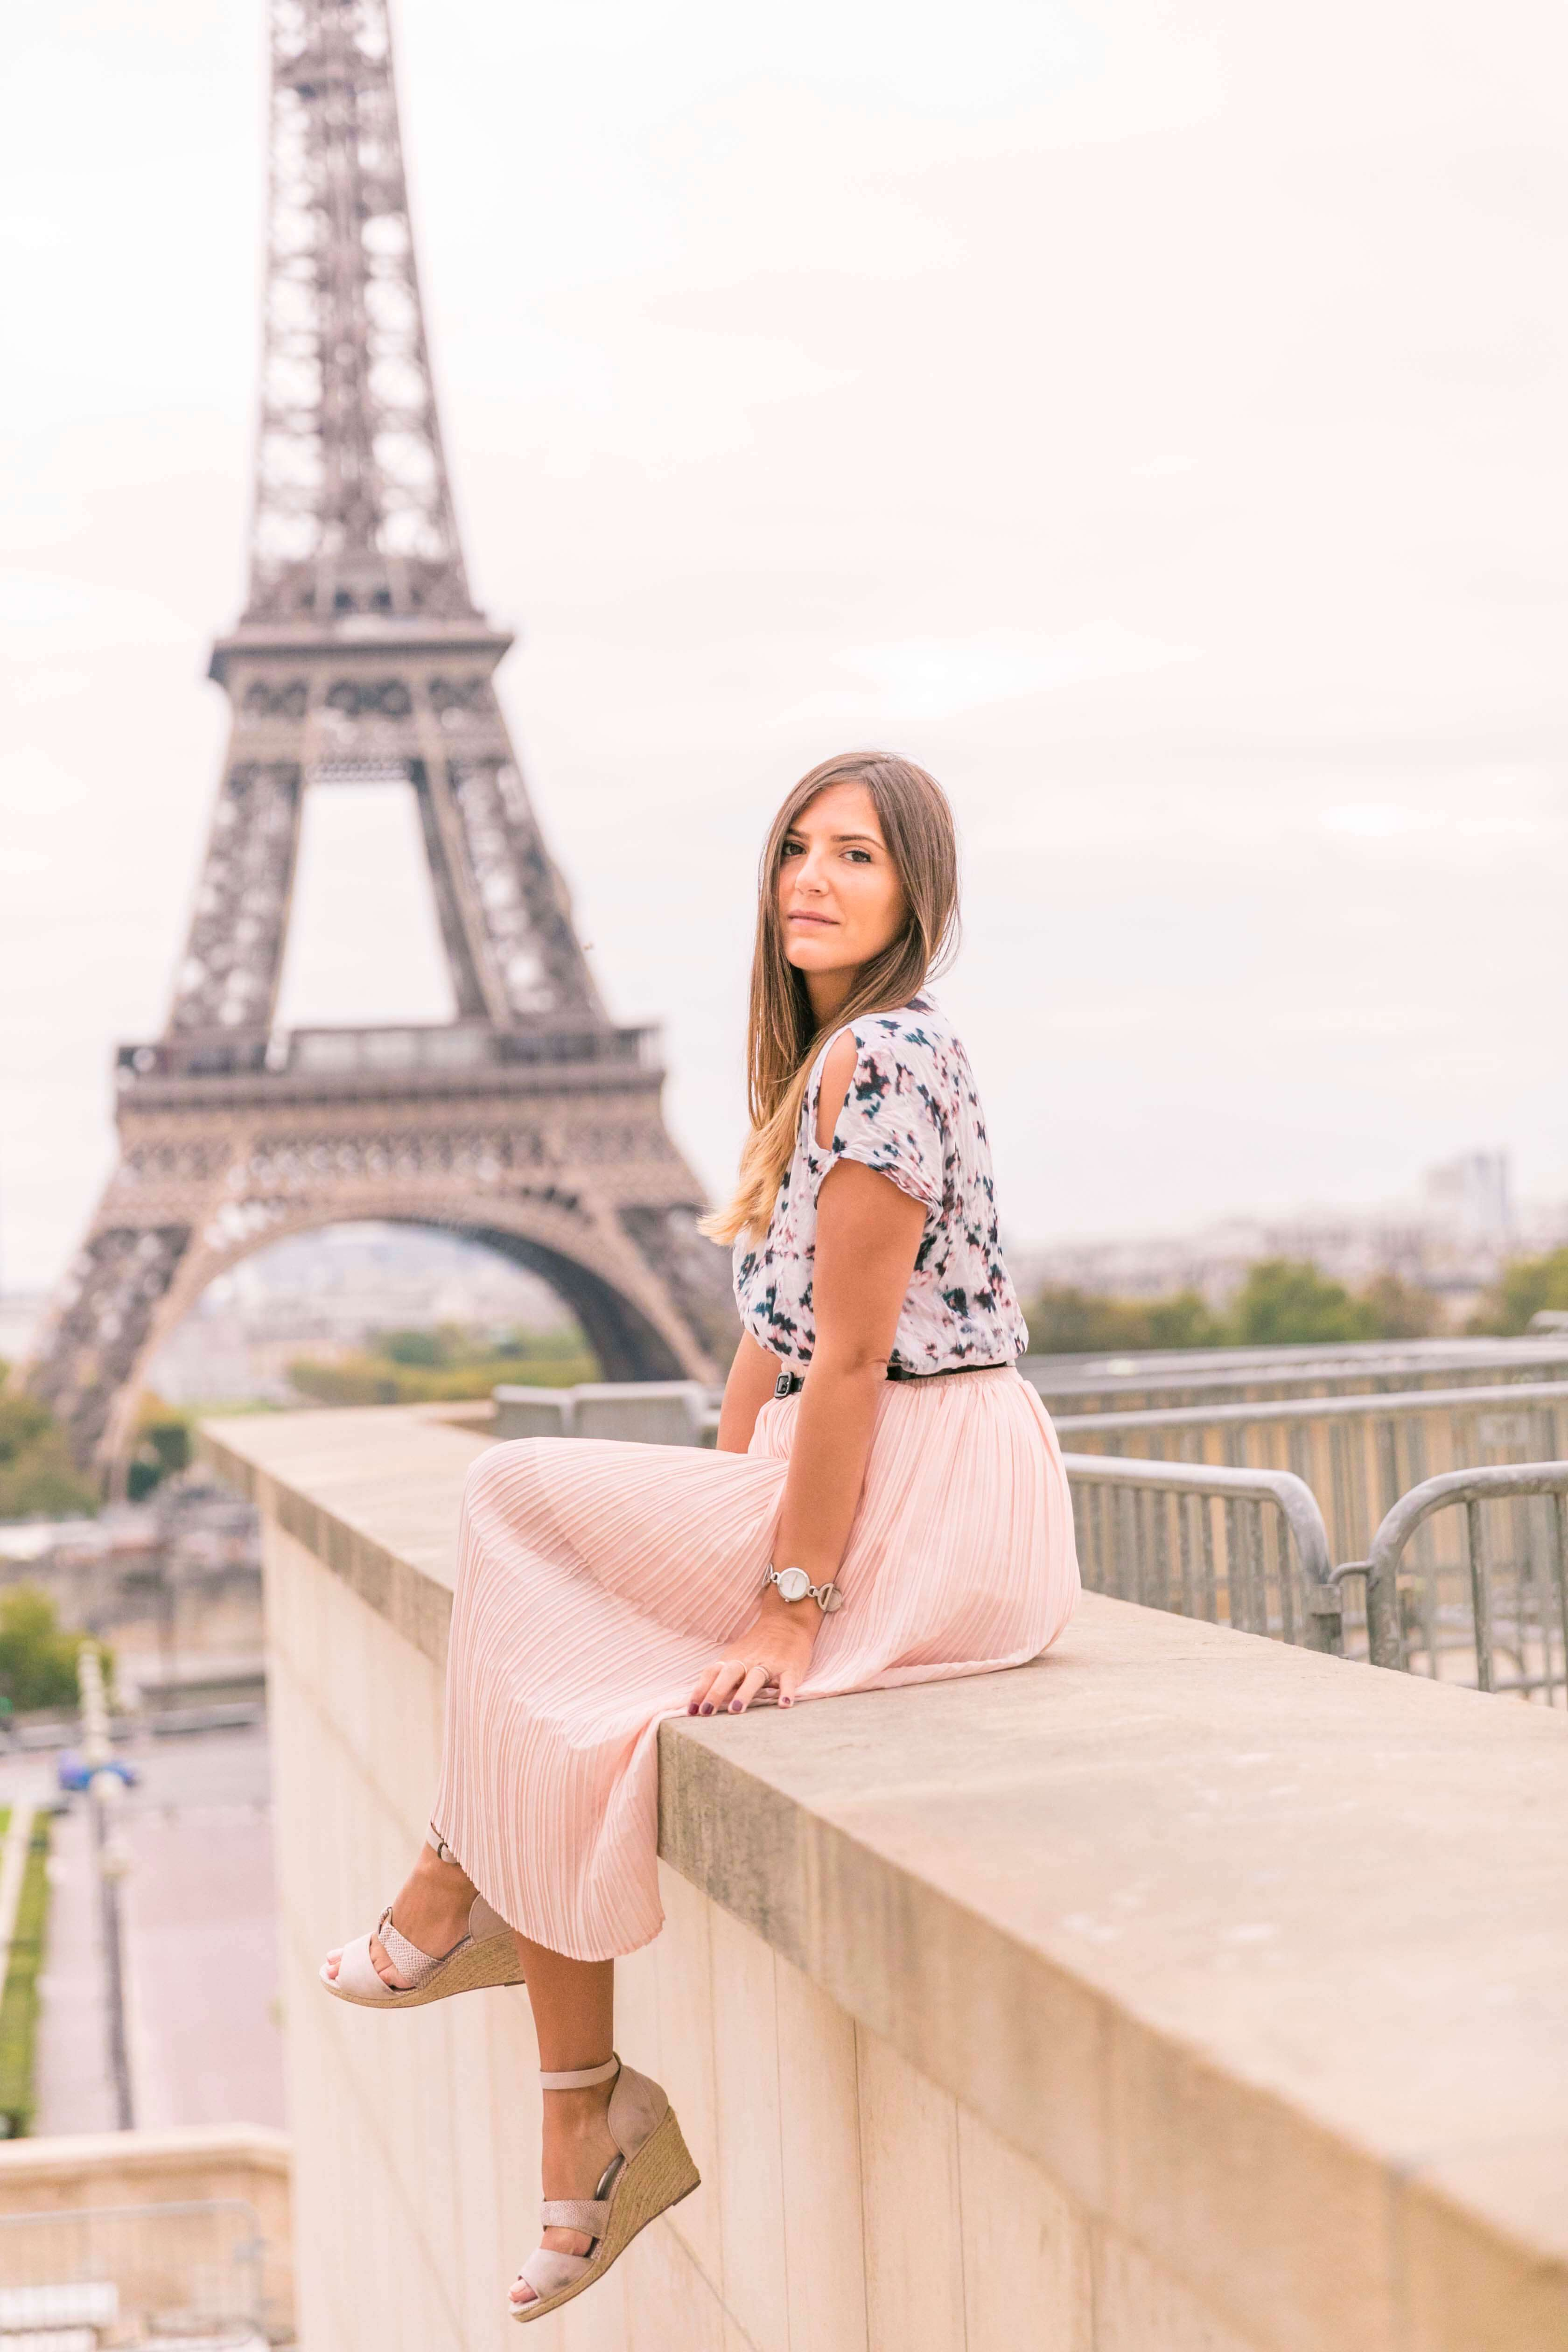 comment porter le look rose blog mode tendance